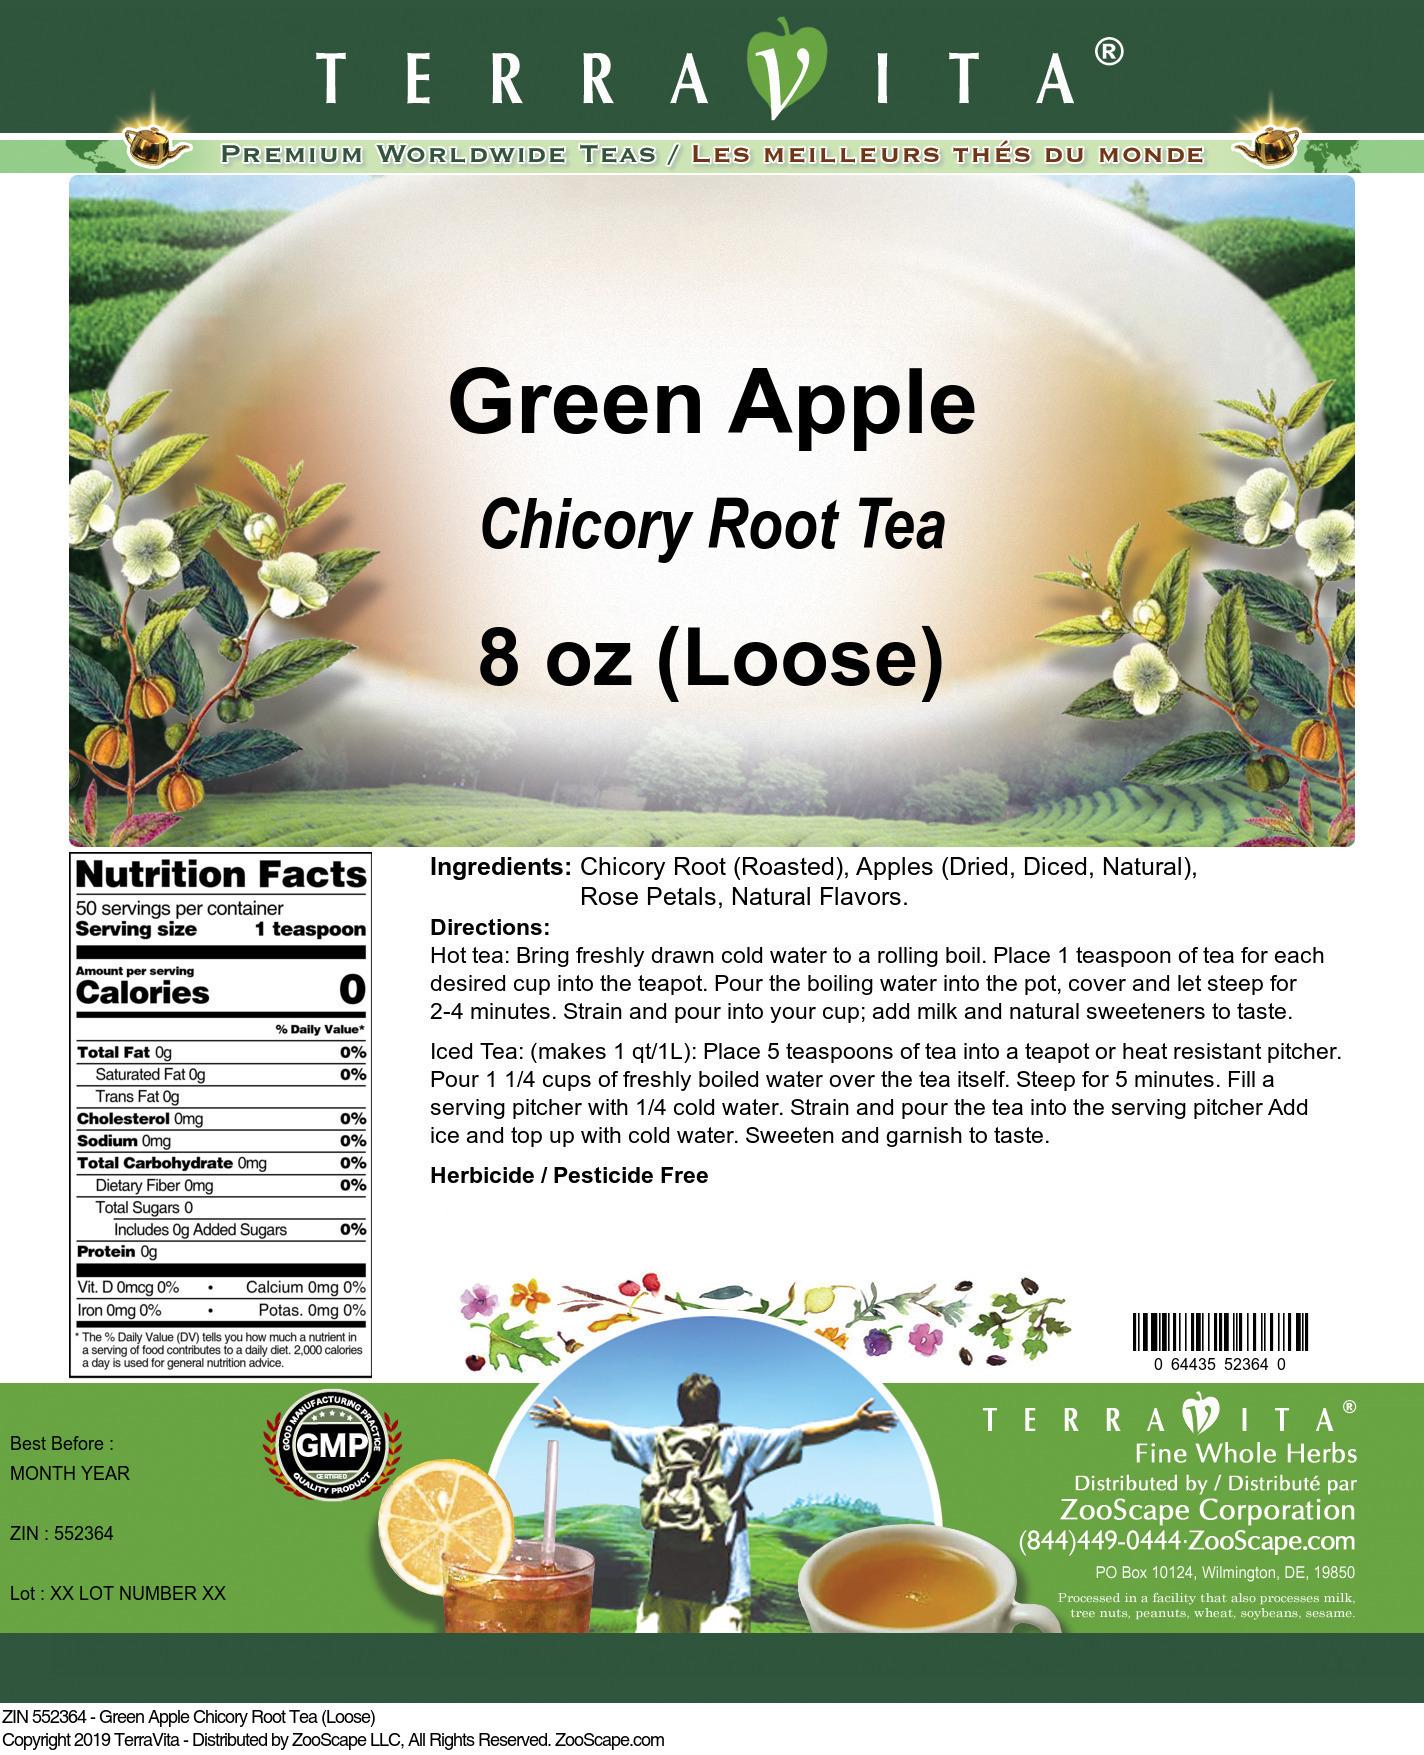 Green Apple Chicory Root Tea (Loose)